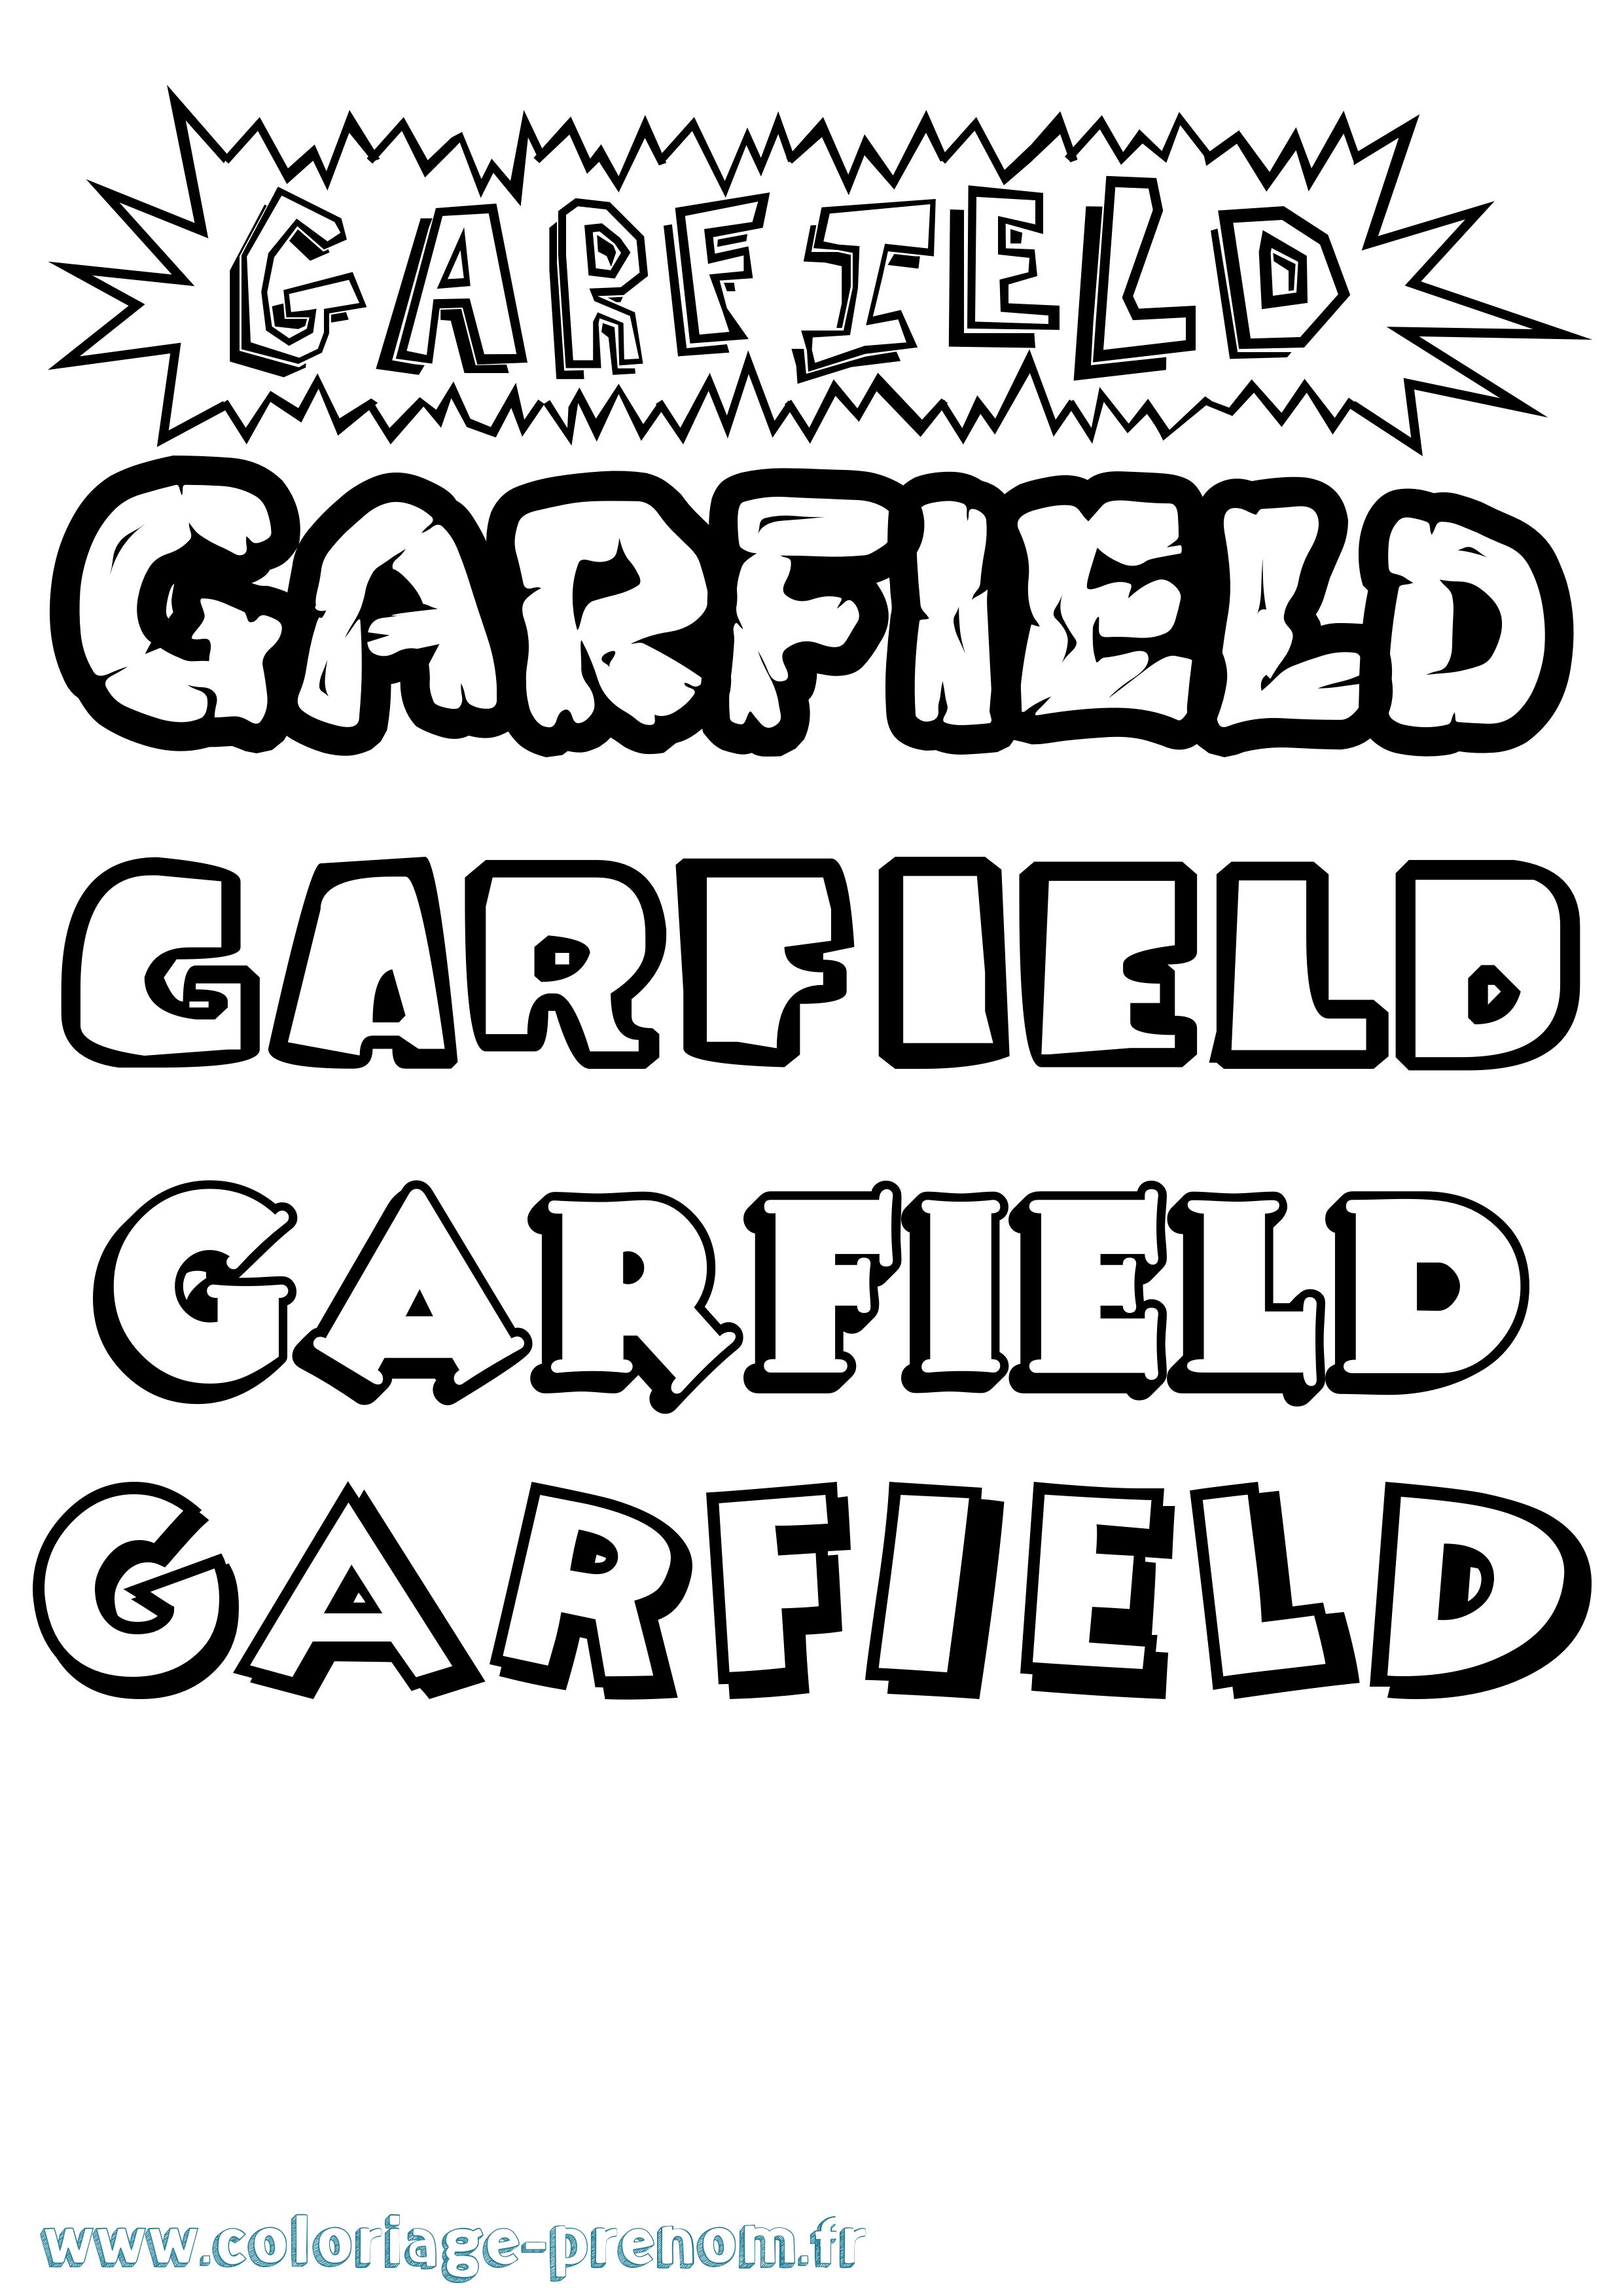 Unique Dessin A Colorier De Garfield